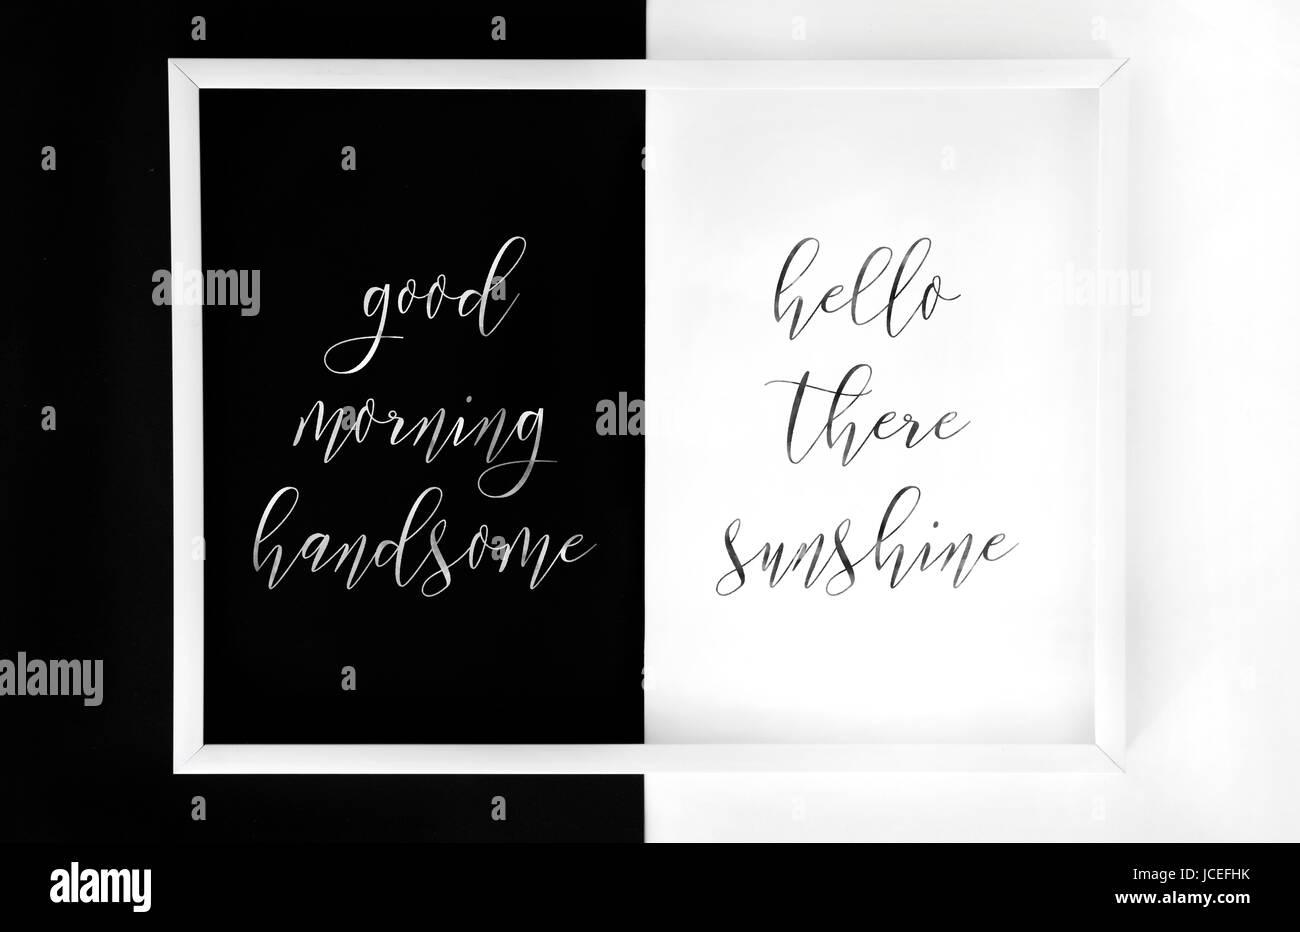 Good Morning Lettering Stockfotos & Good Morning Lettering Bilder ...